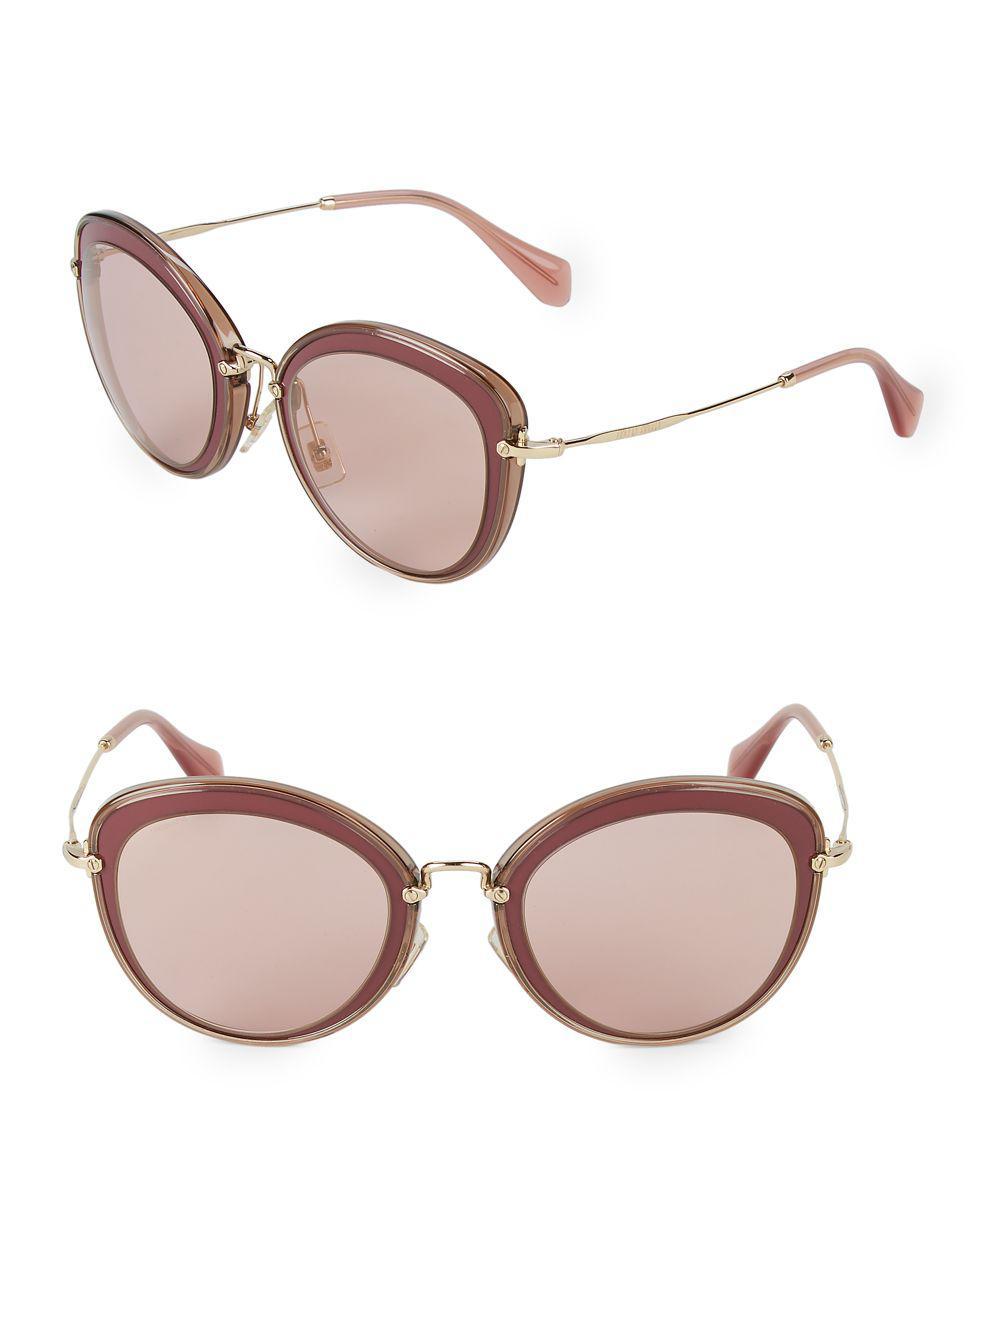 5d8168006cf49 Miu Miu. Women s 54mm Butterfly Sunglasses